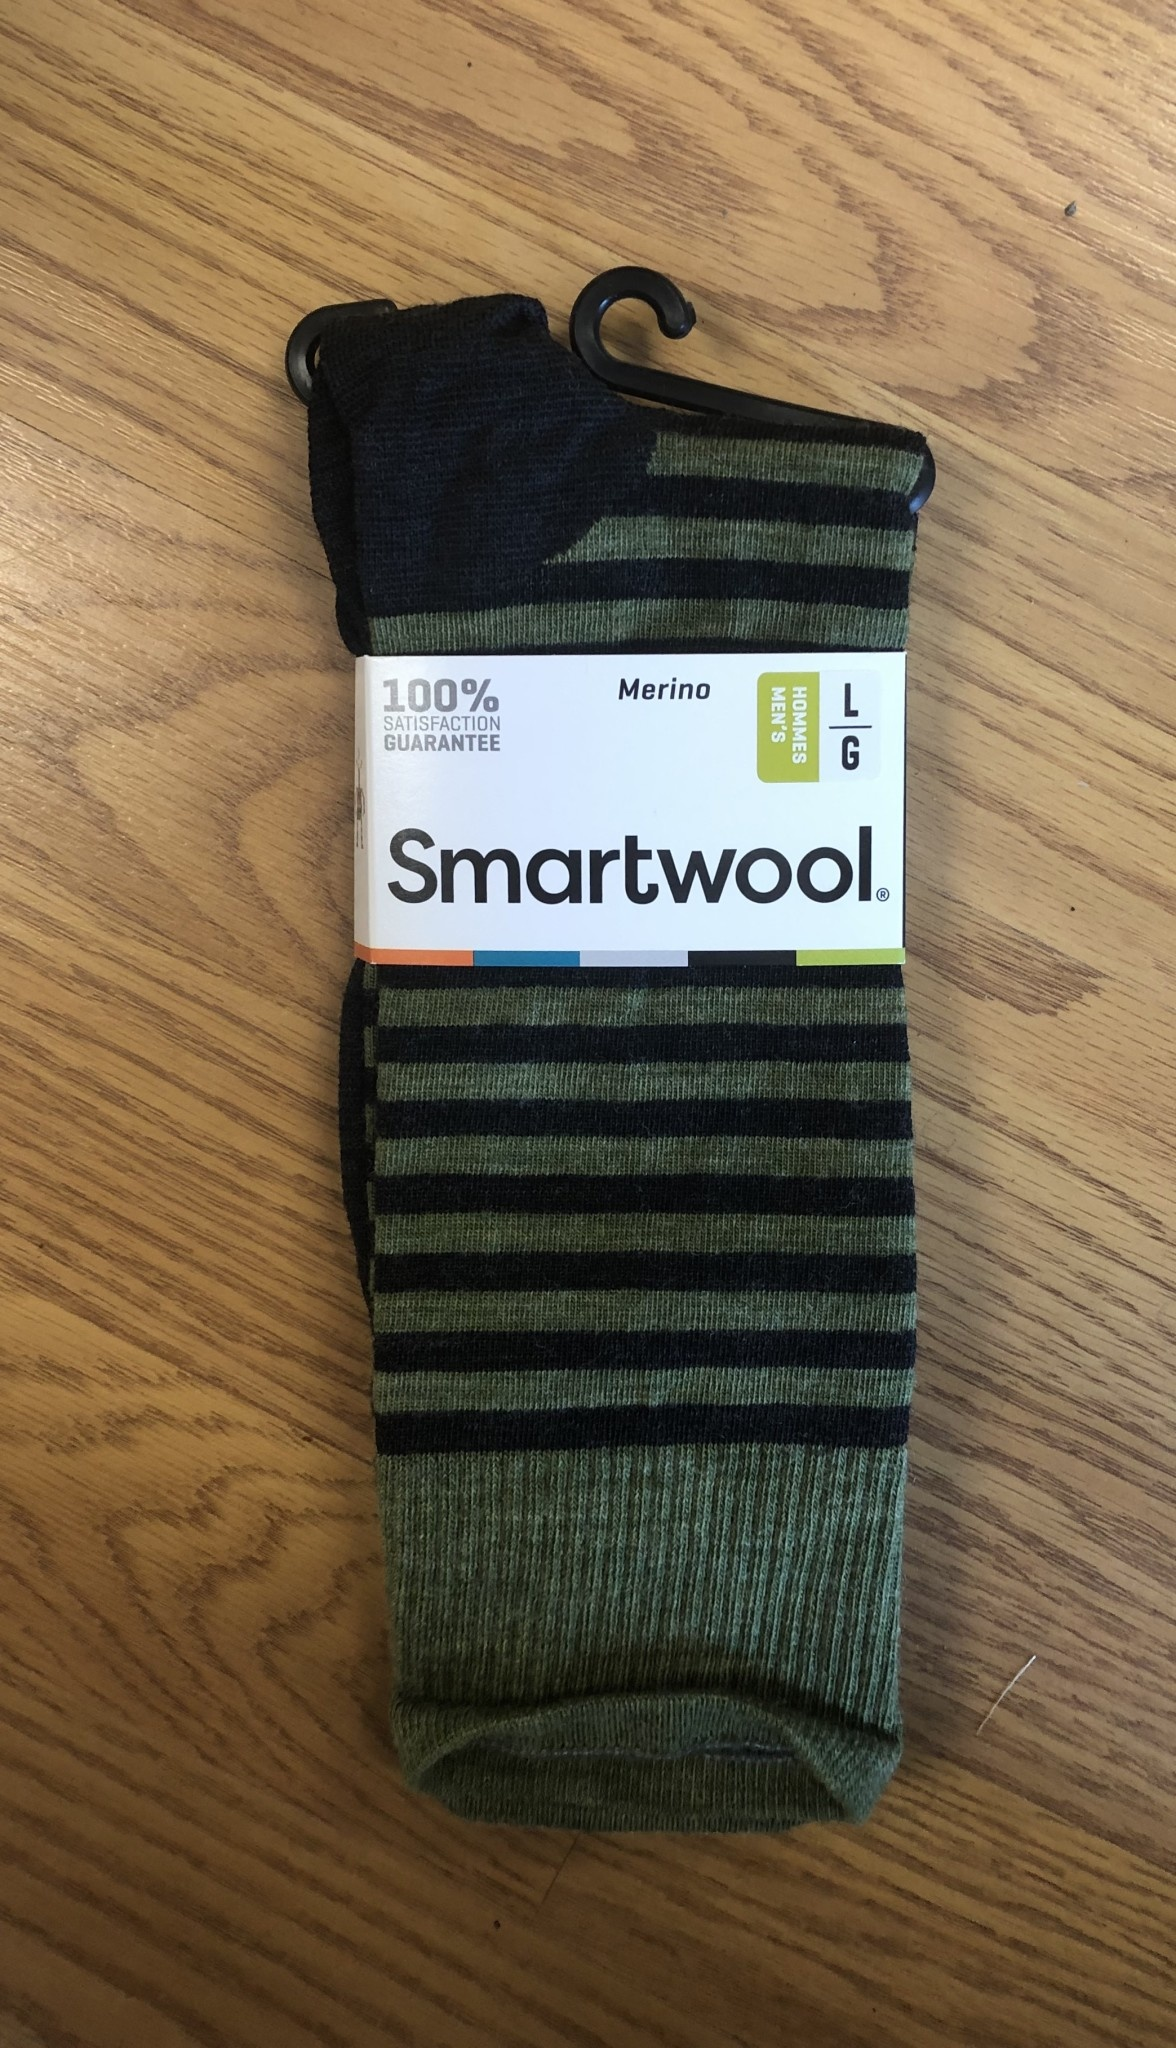 Smartwool Smartwool Men's Stria Crew Socks,